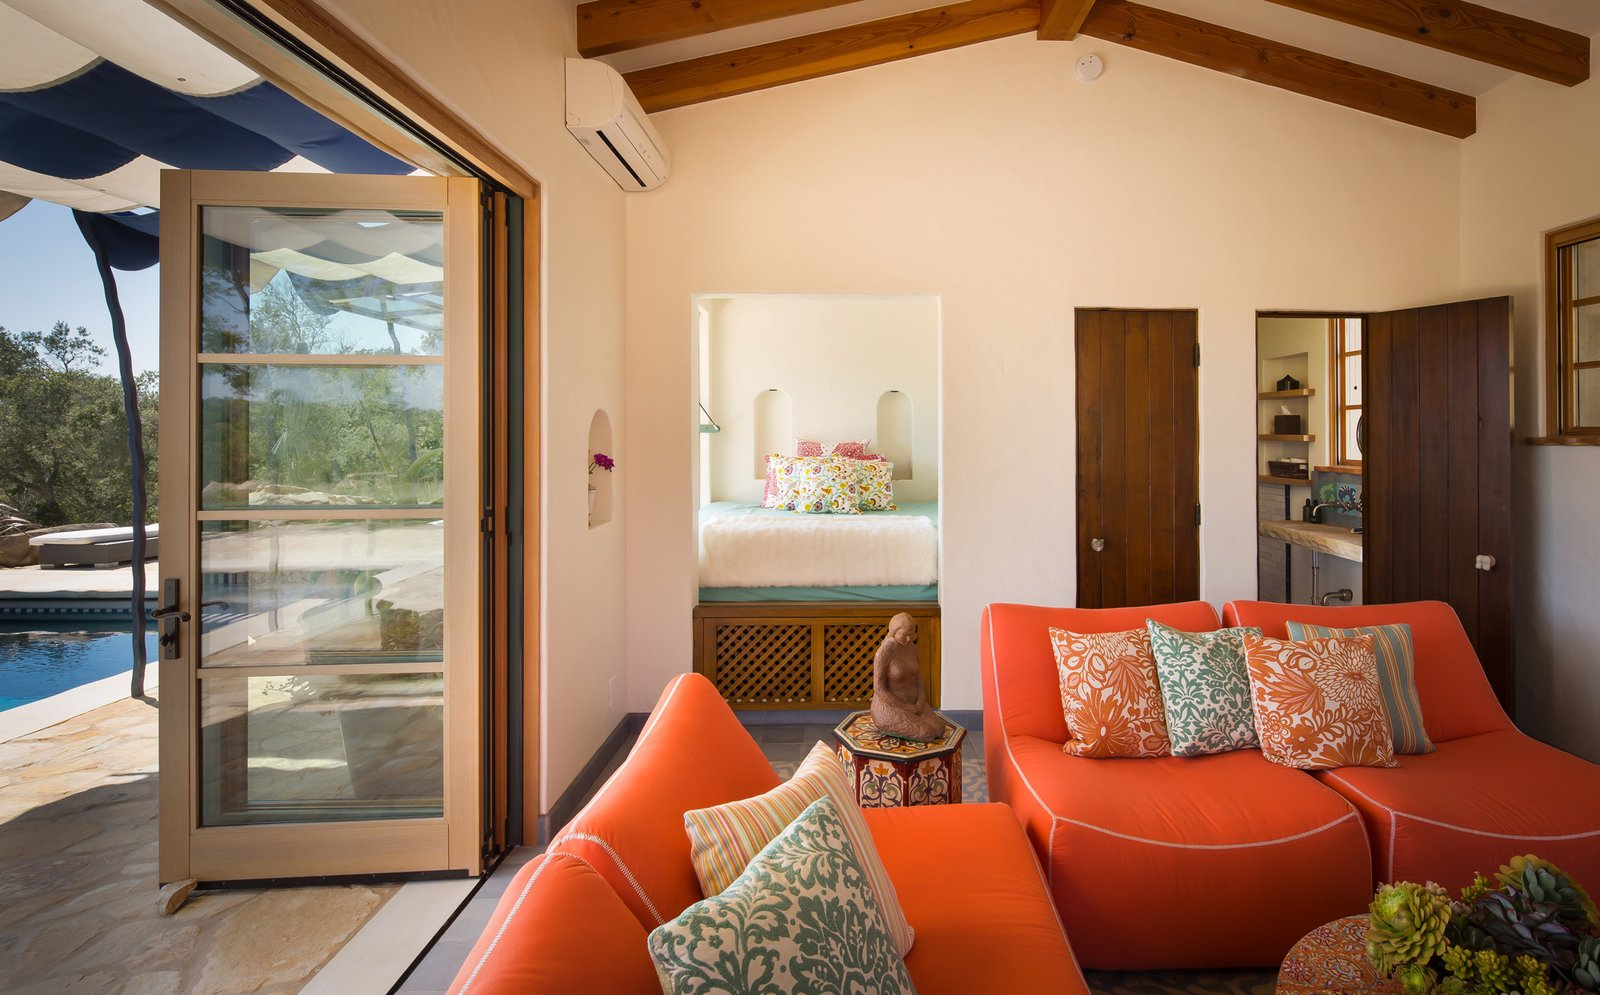 La Roca by Jeff Shelton Architect